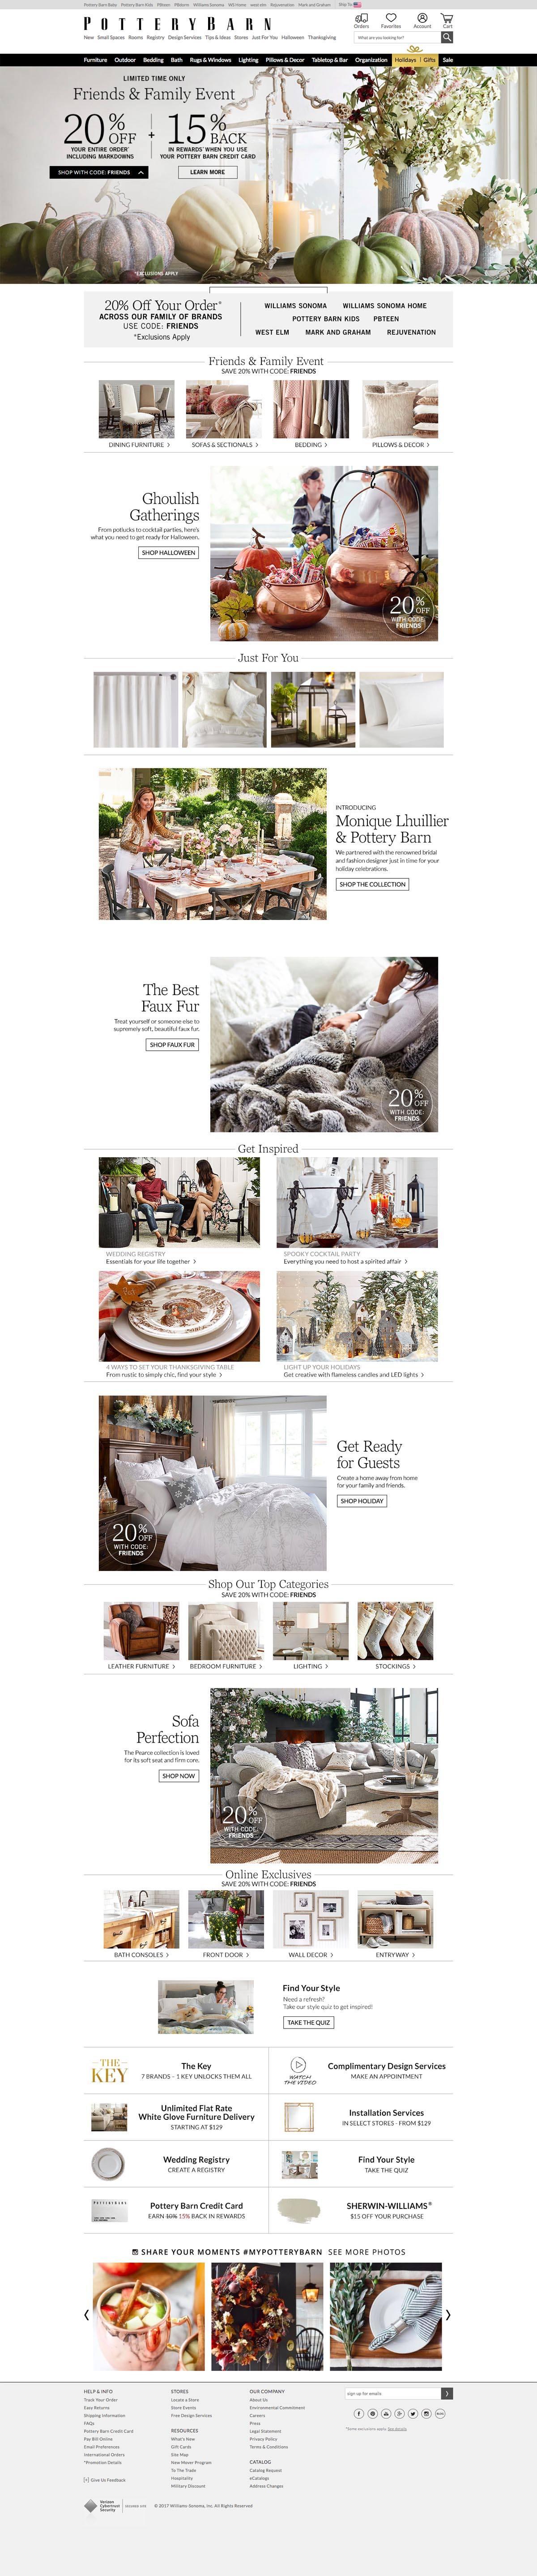 eCommerce website: Pottery Barn